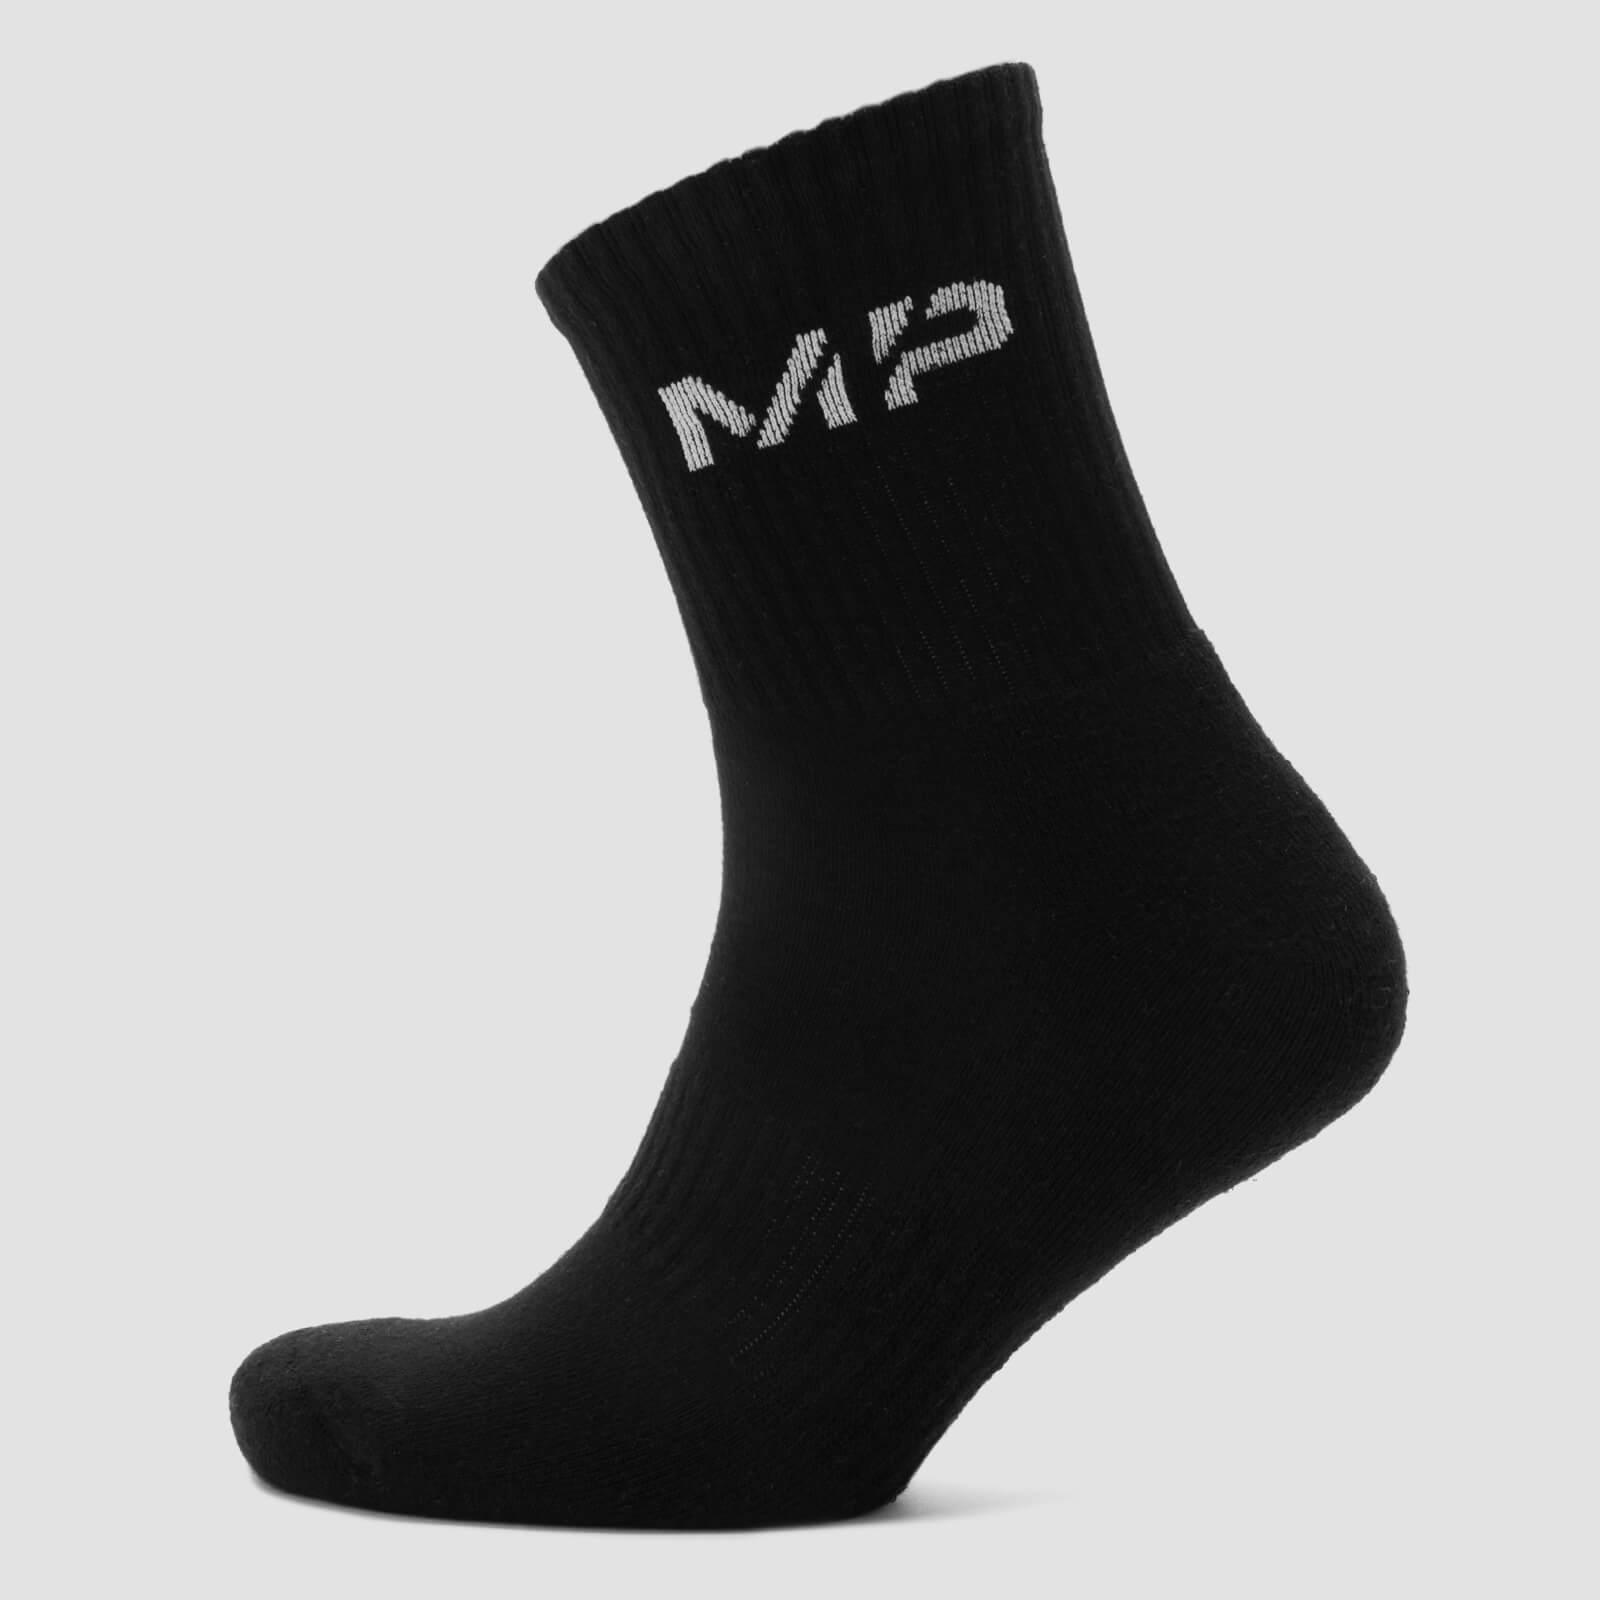 Myprotein MP Men's Core Crew Socks (2 Pack) - Black - UK 6-8